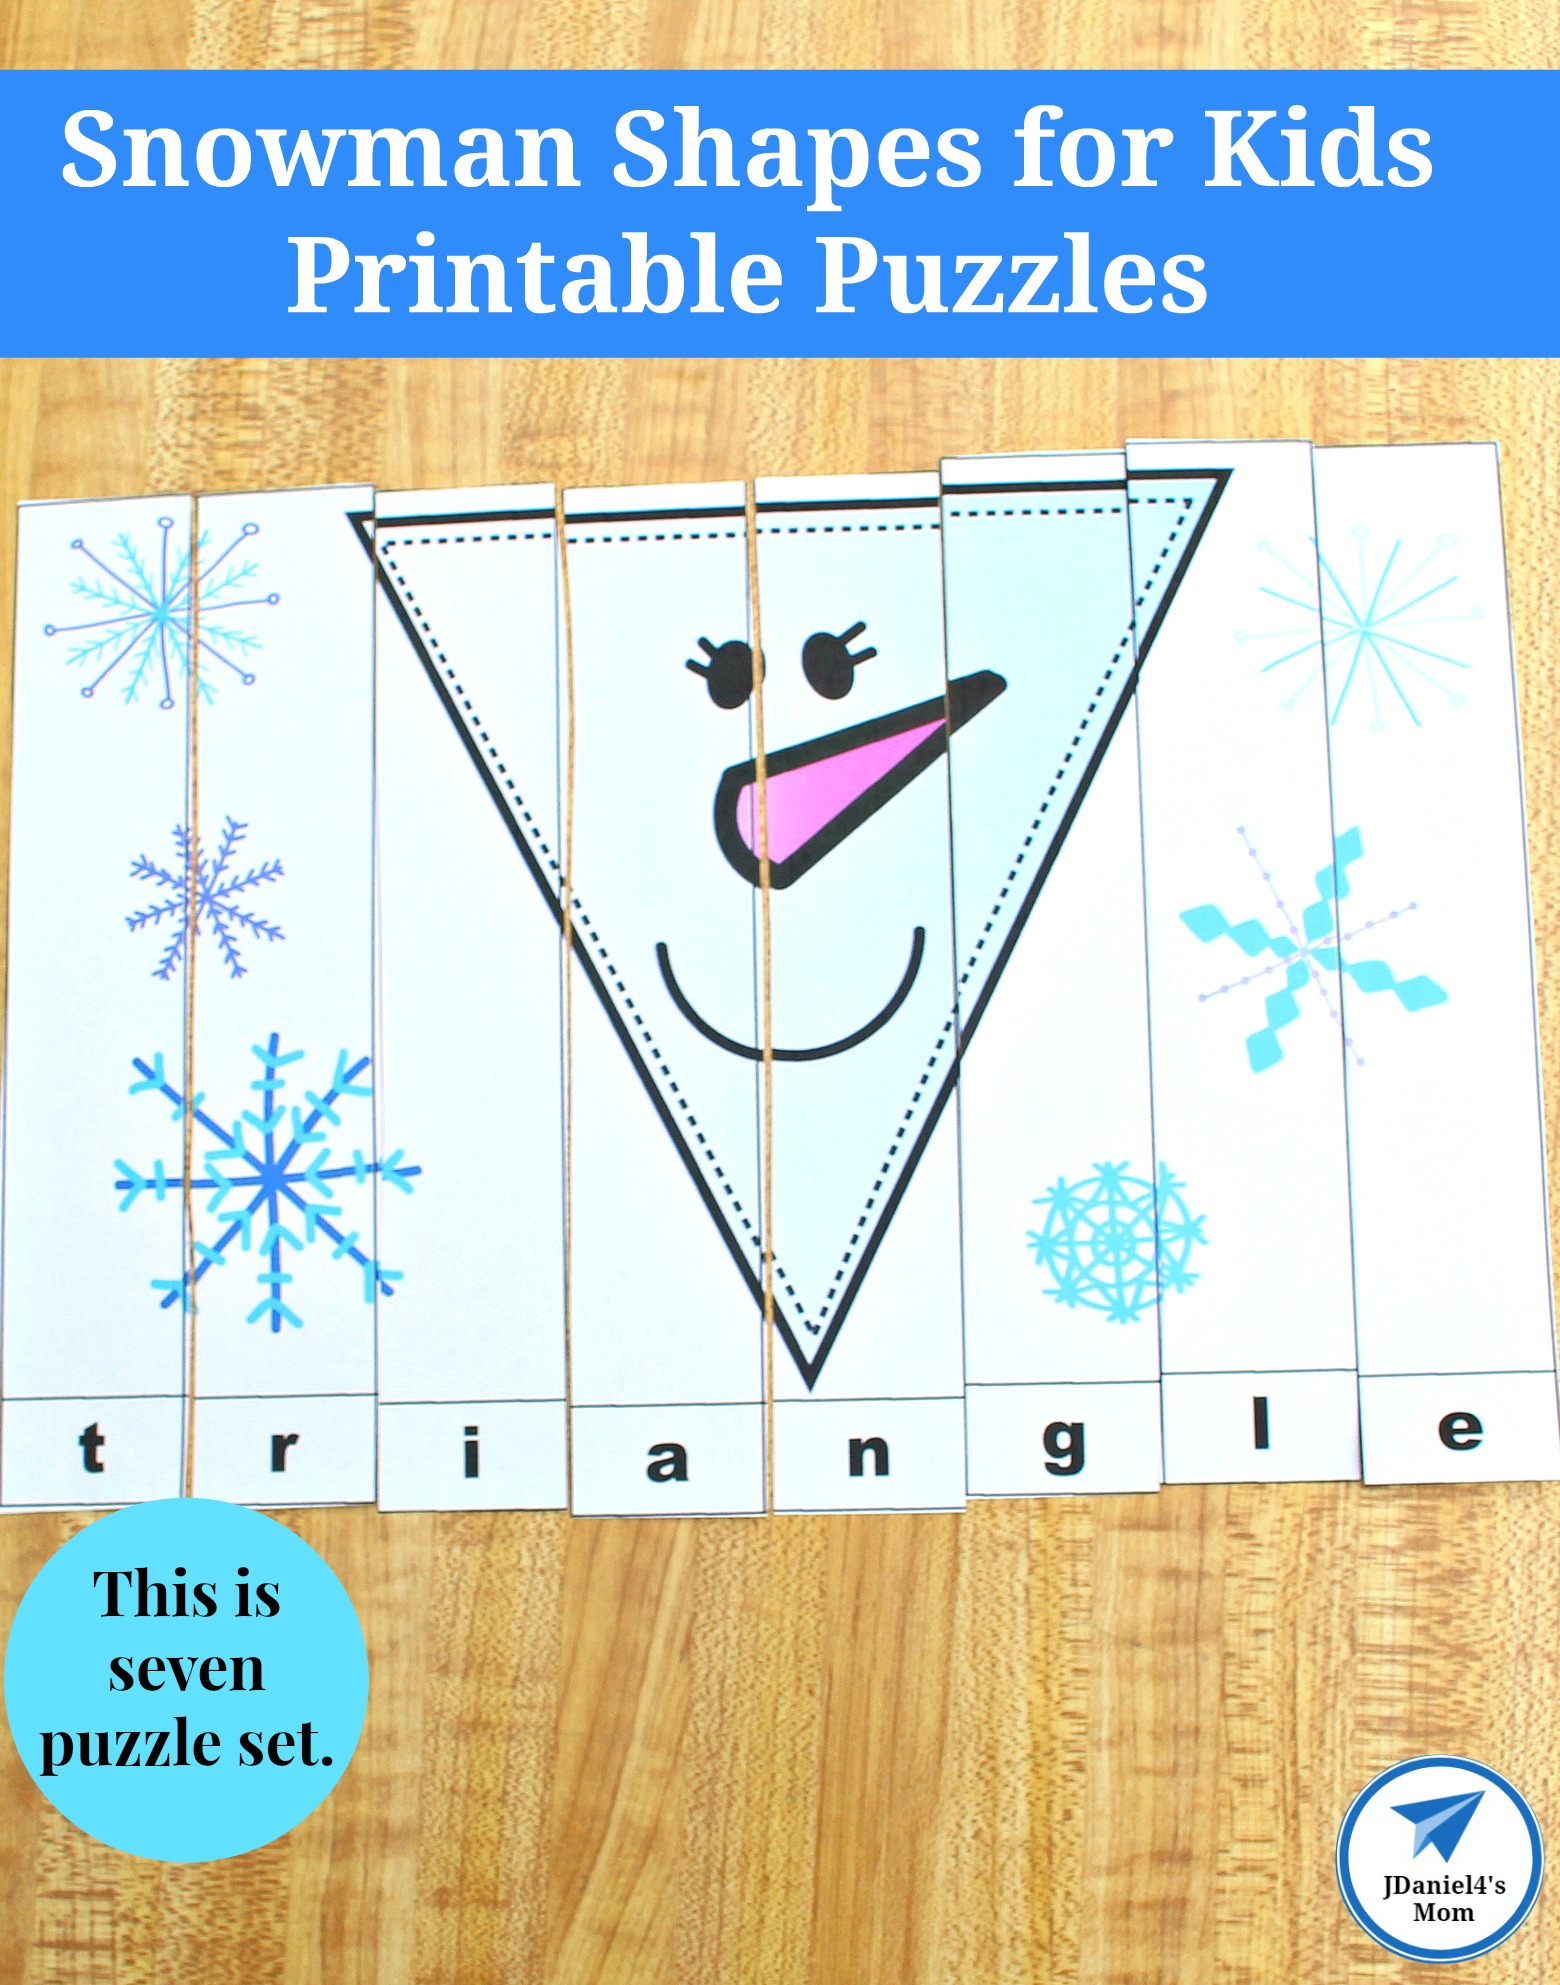 Snowman Shapes For Kids Printable Puzzles - Jdaniel4S Mom - Printable Snowman Puzzle